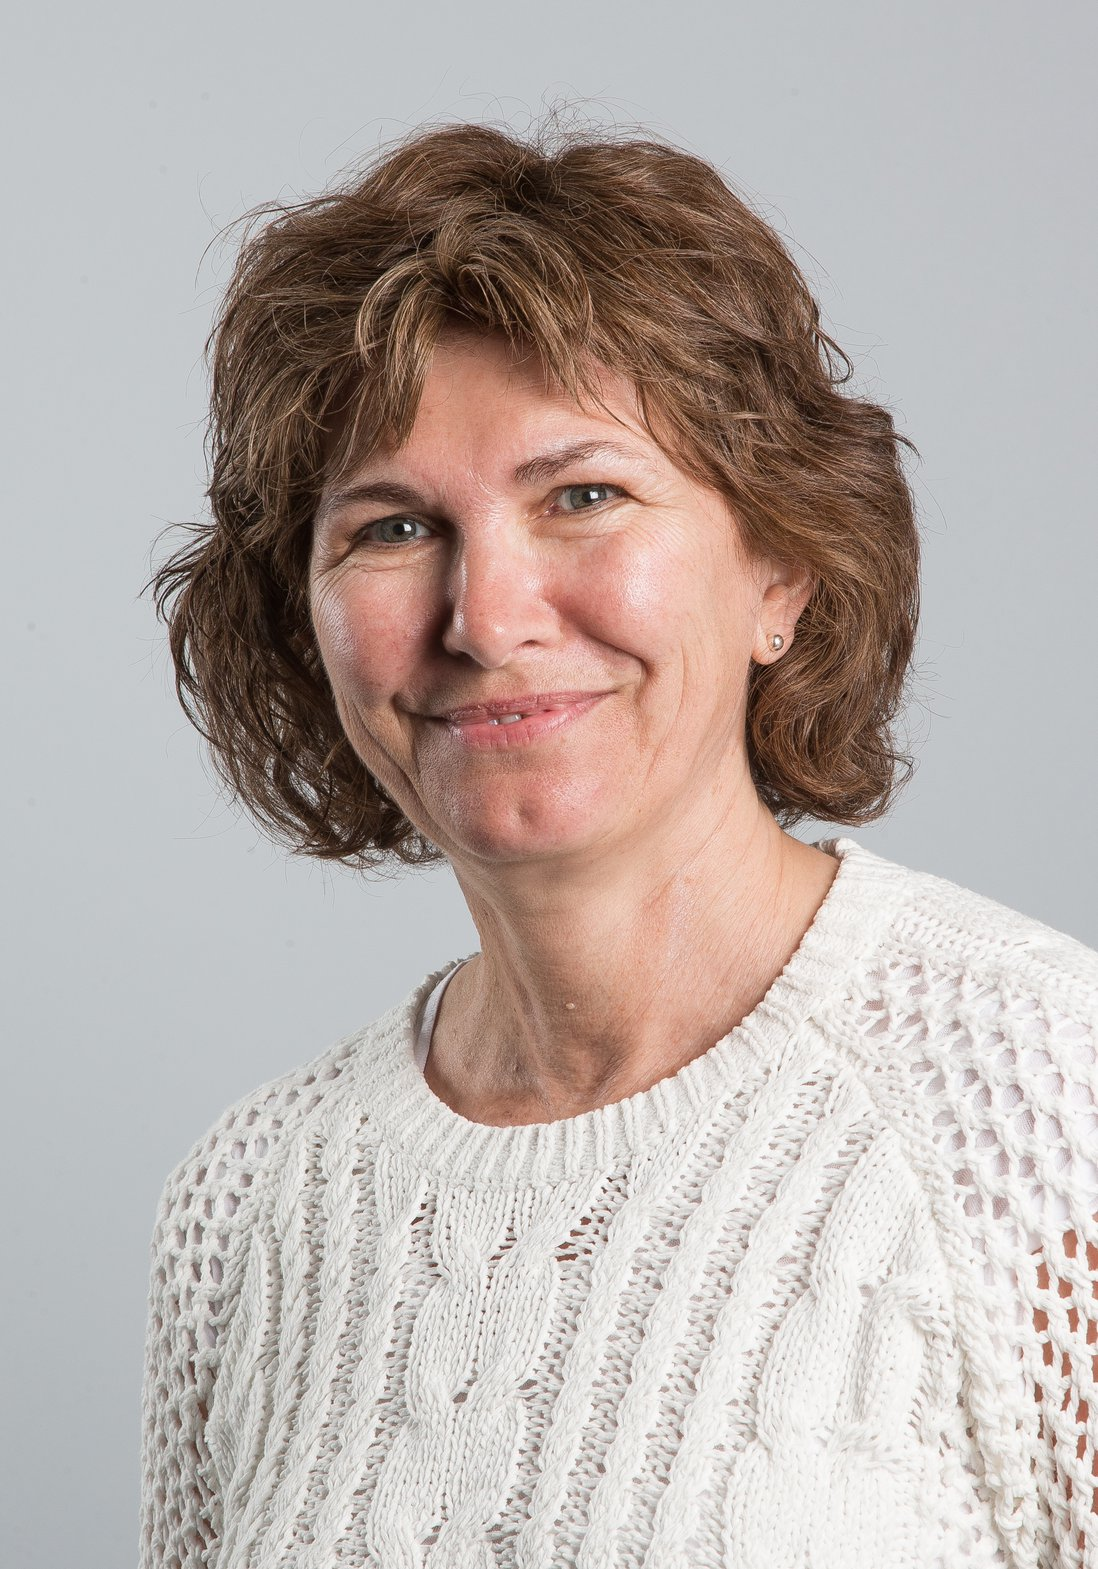 Marit Fossberg